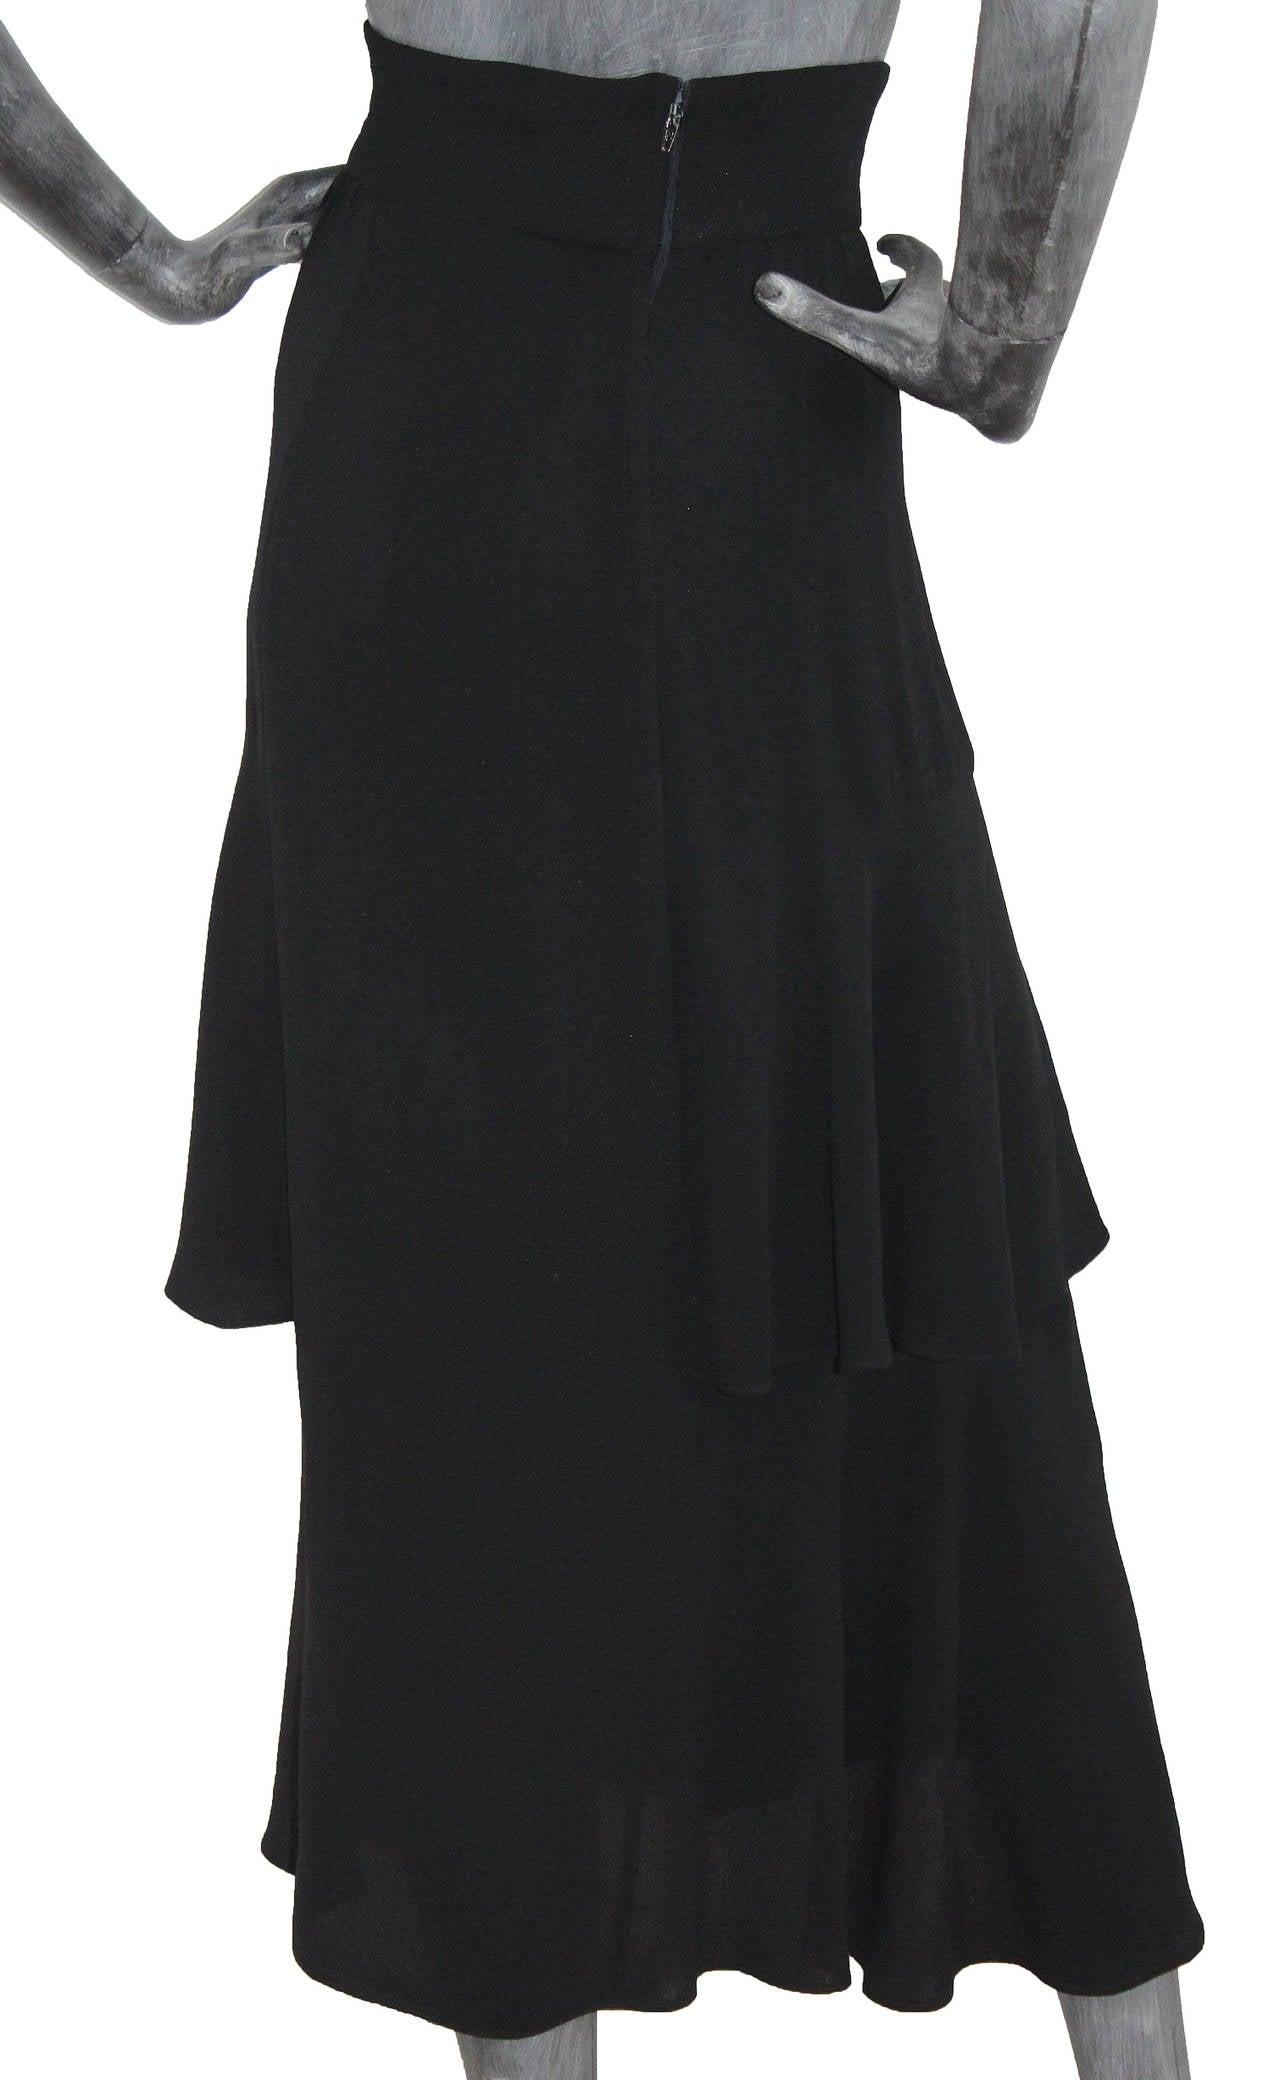 Ossie Clark High Waist Black Moss Crepe Skirt With Peplum Inserts c.1970 2